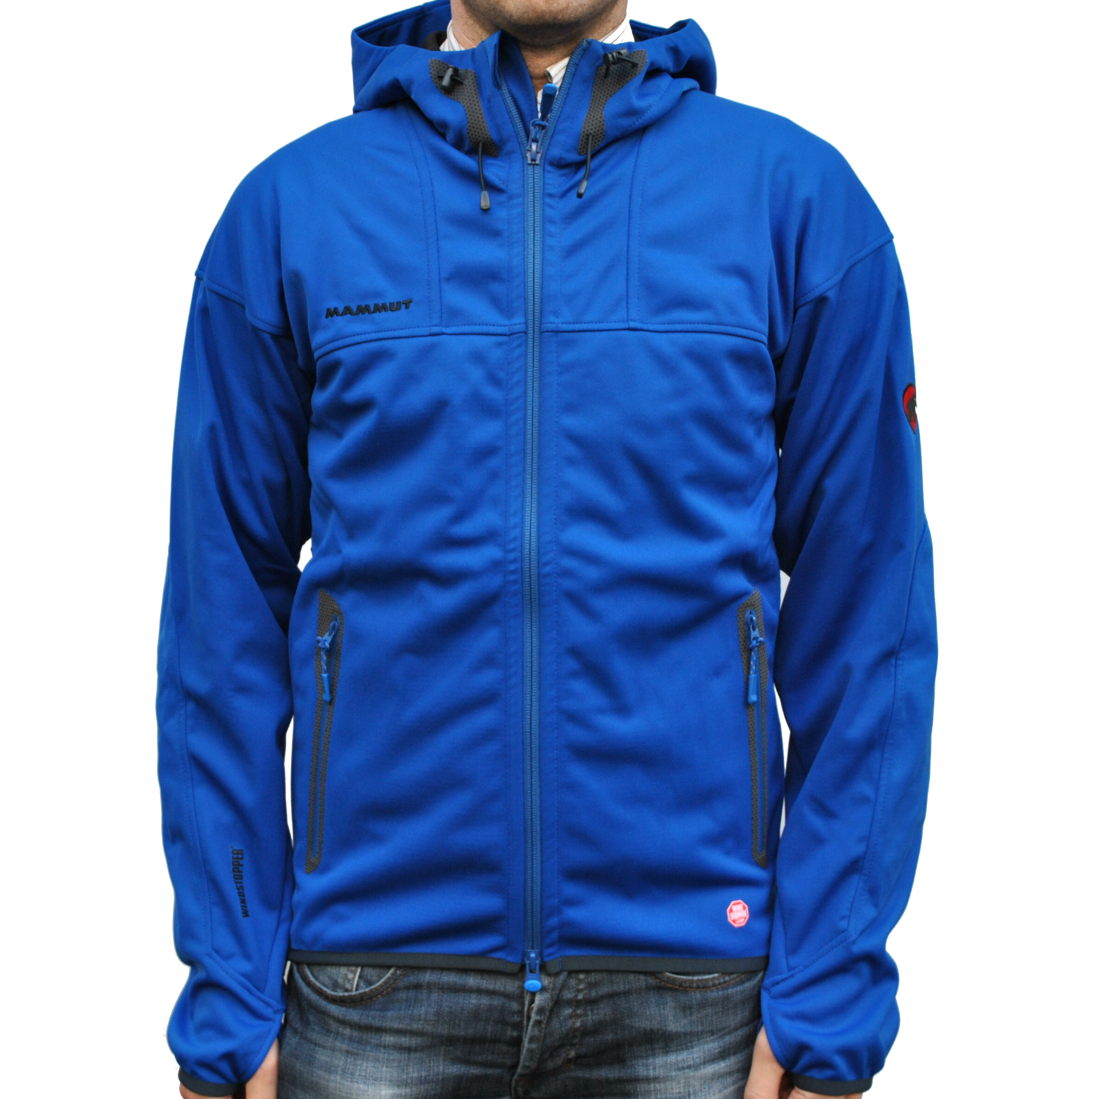 buy popular 76c45 4a86a Mammut Ultimate Hoody Men Soft Shell Jacke Blau Cruise ...